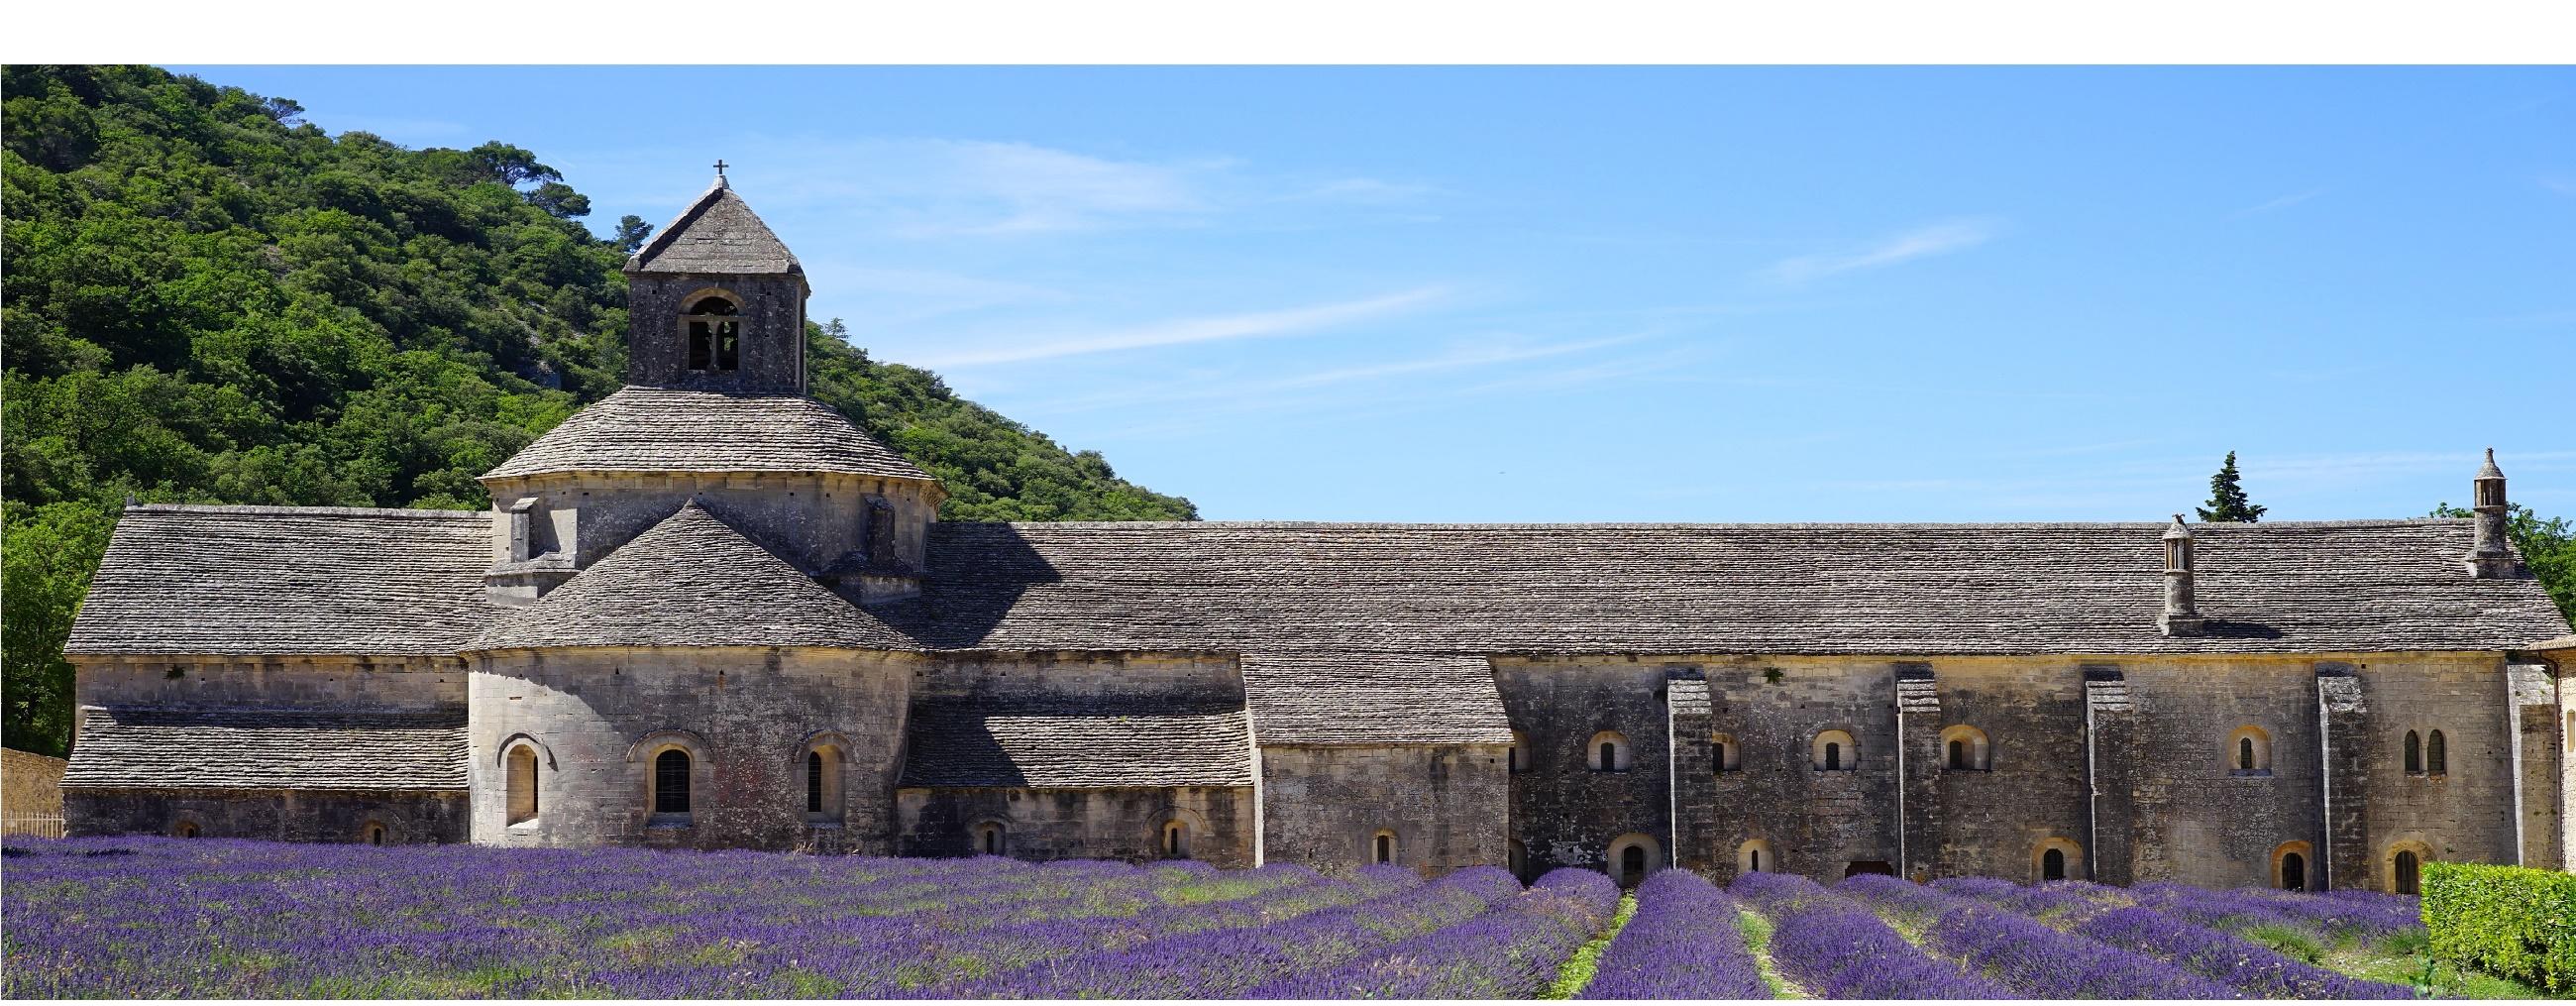 abbaye-de-senanque-Tours